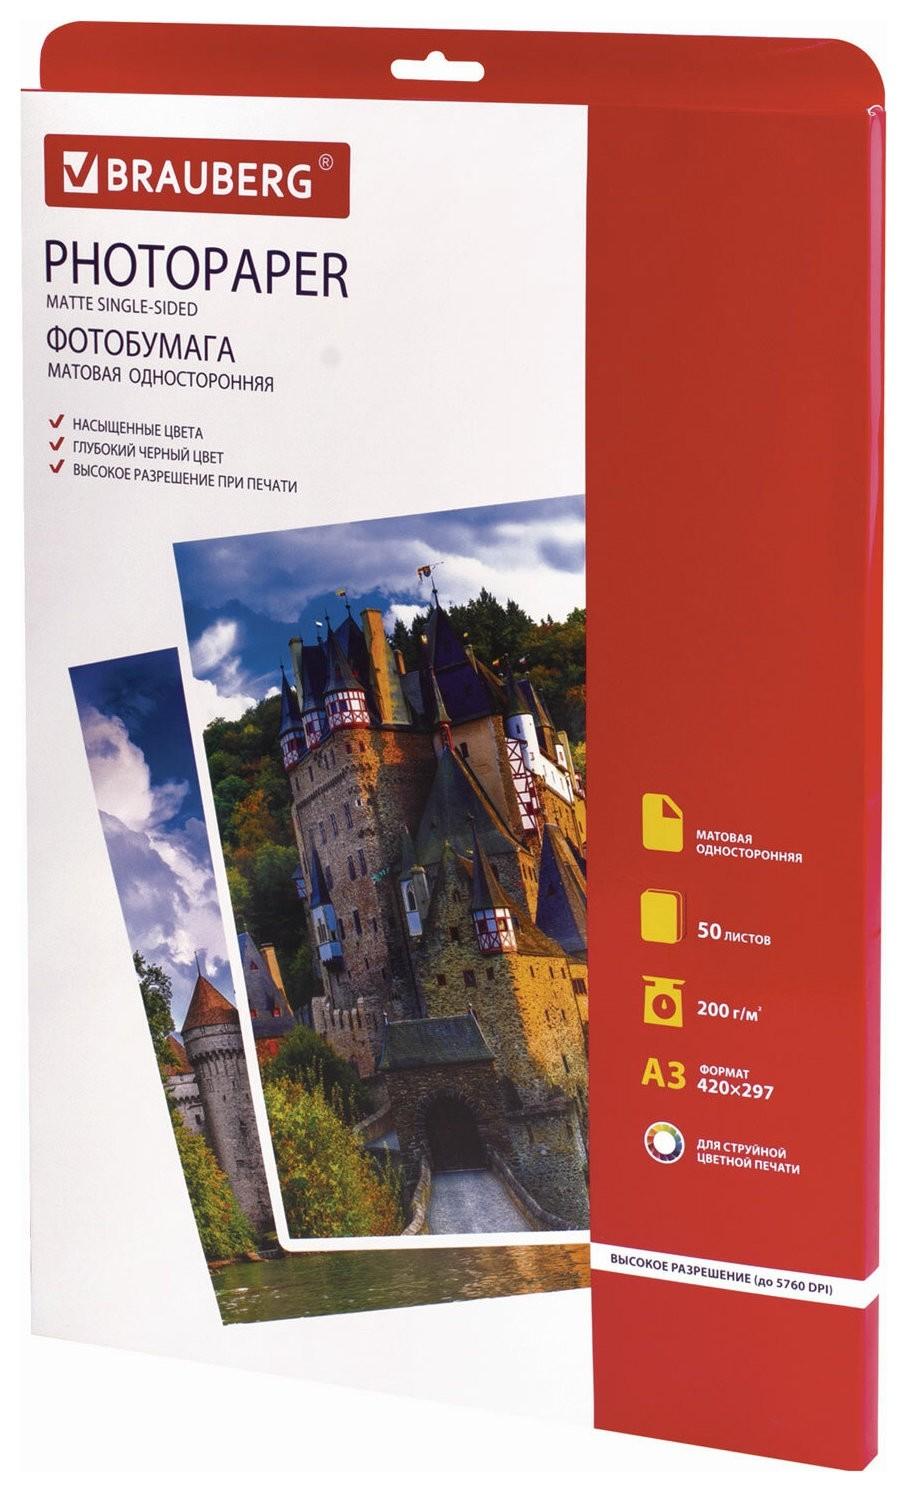 Фотобумага для струйной печати большого формата, A3, 200 г/м2, 50 л., односторонняя матовая, Brauberg, 363323  Brauberg